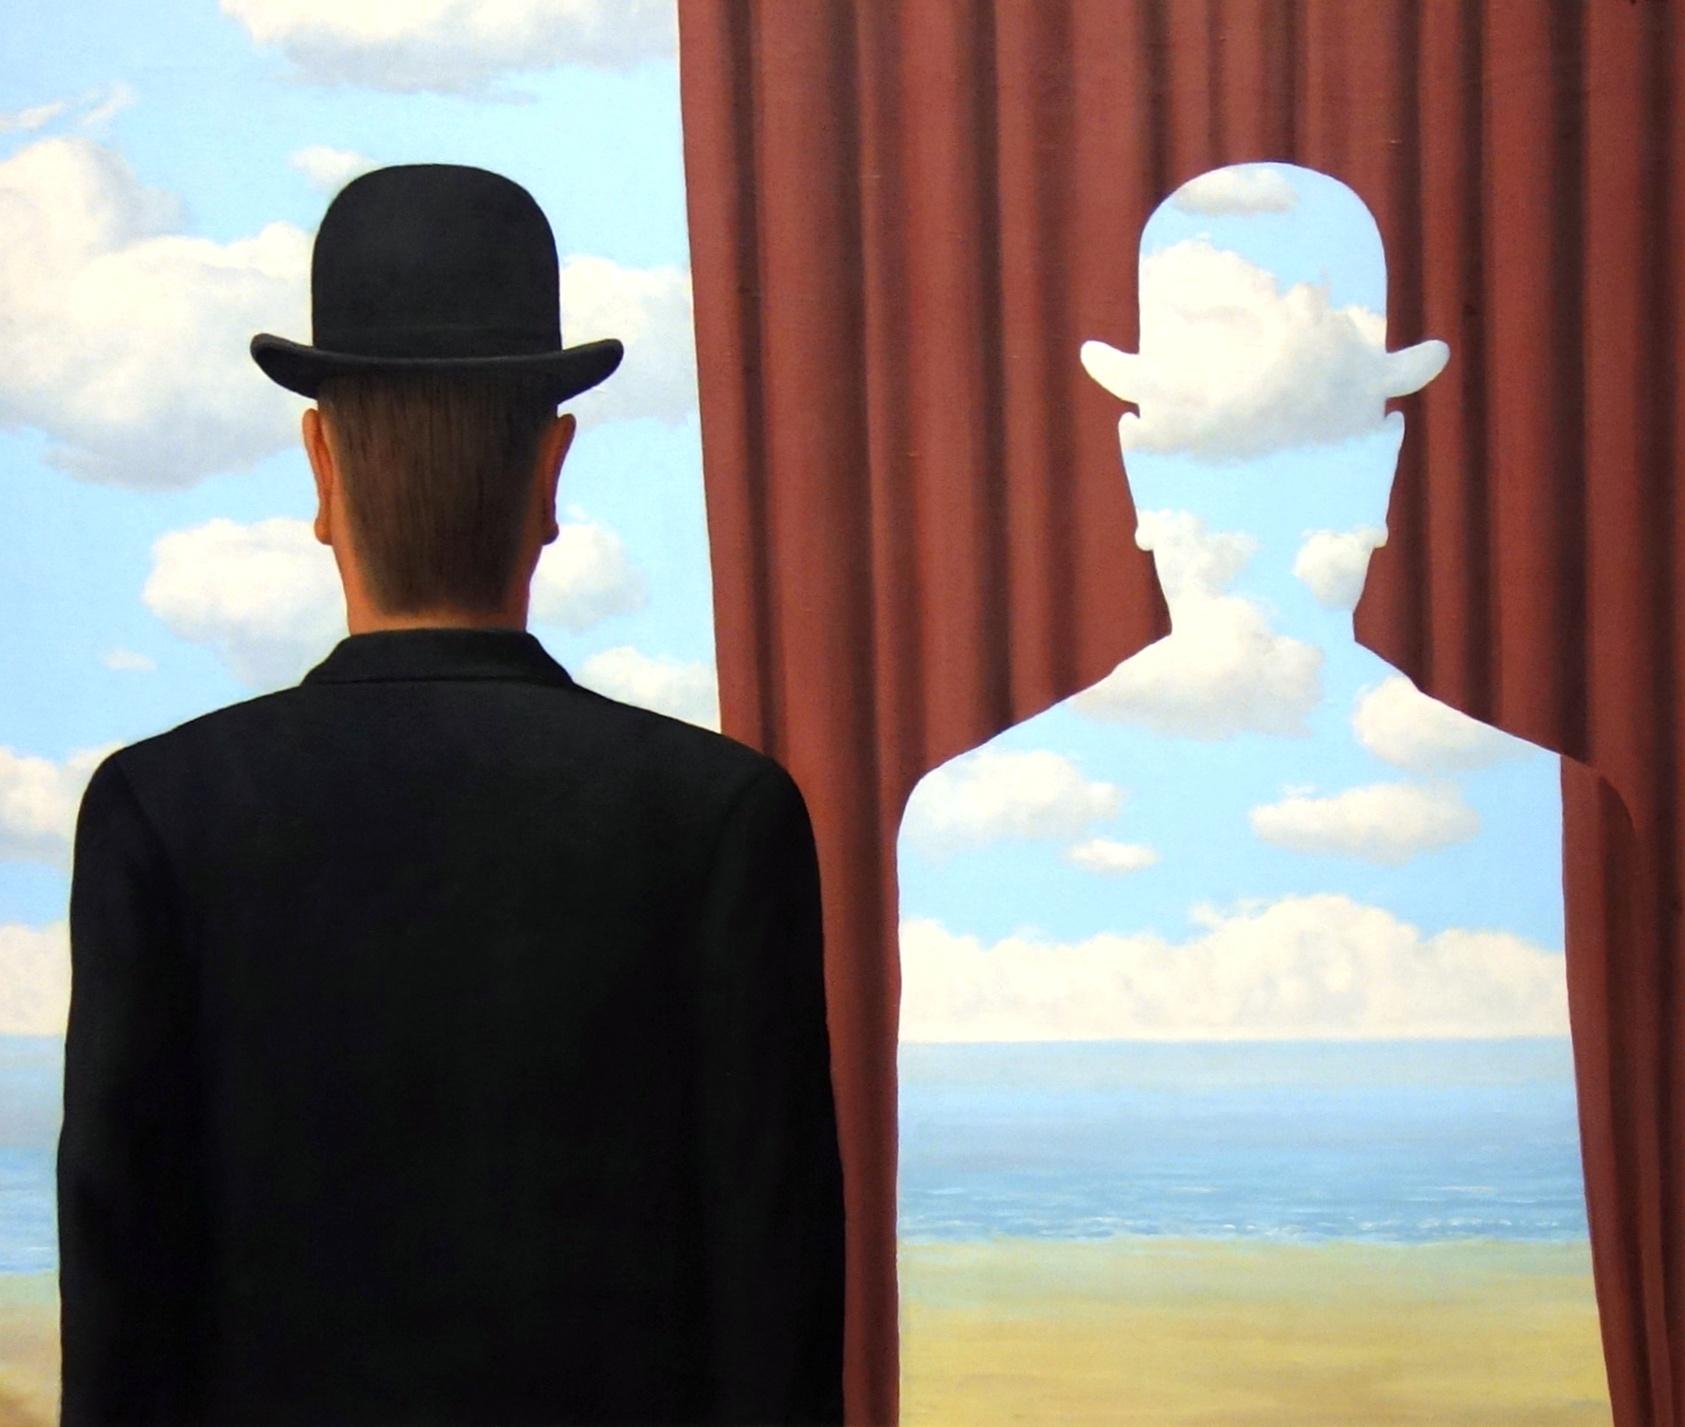 René Magritte Decalcomania, 1966 ©Collezione Dr. Noémi Perelman Mattis e Dr. Daniel C. Mattis